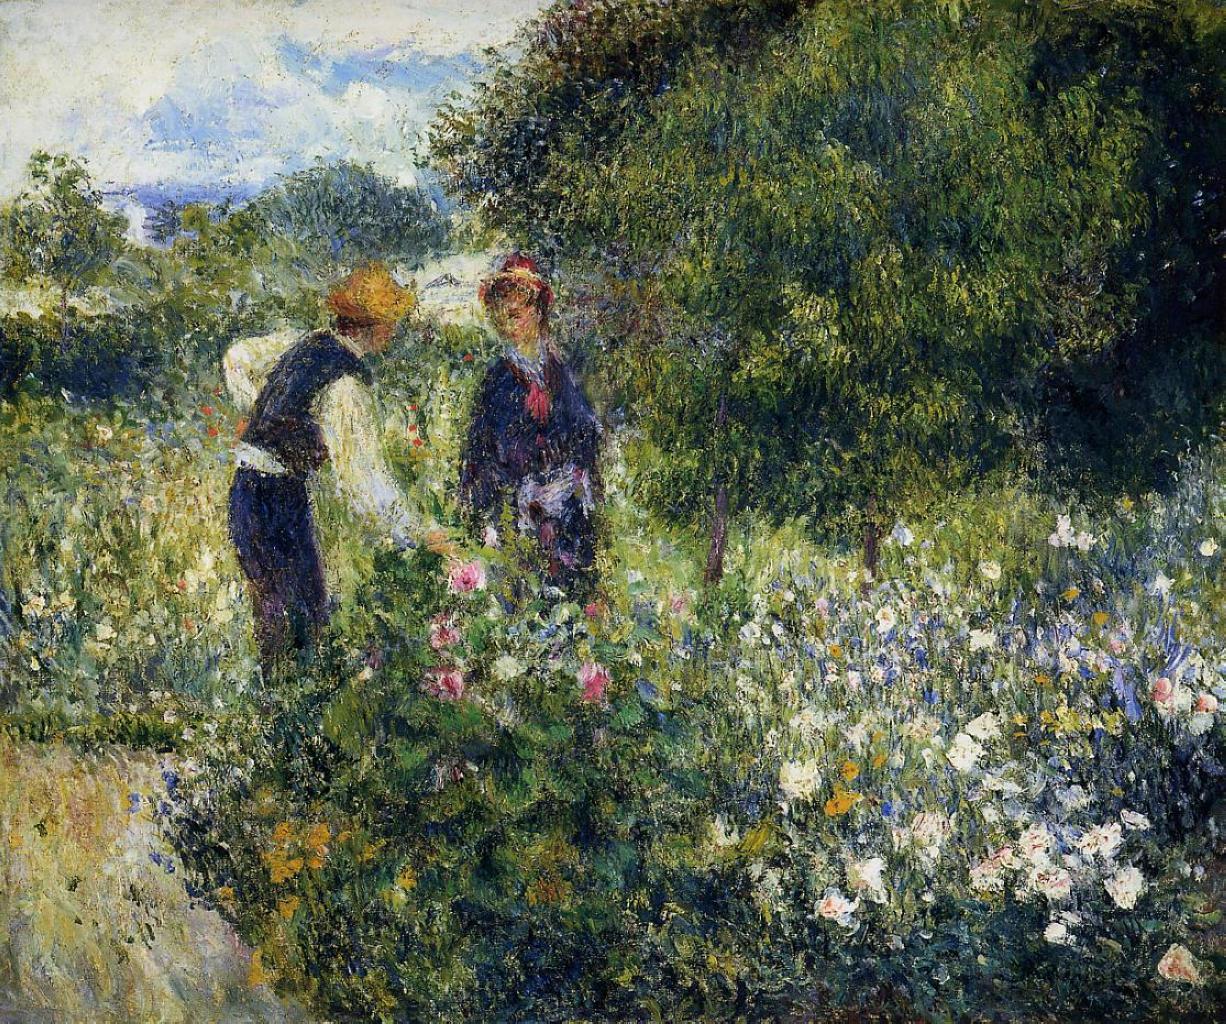 Pierre auguste renoir impressionist painter part 4 for Paintings by renoir